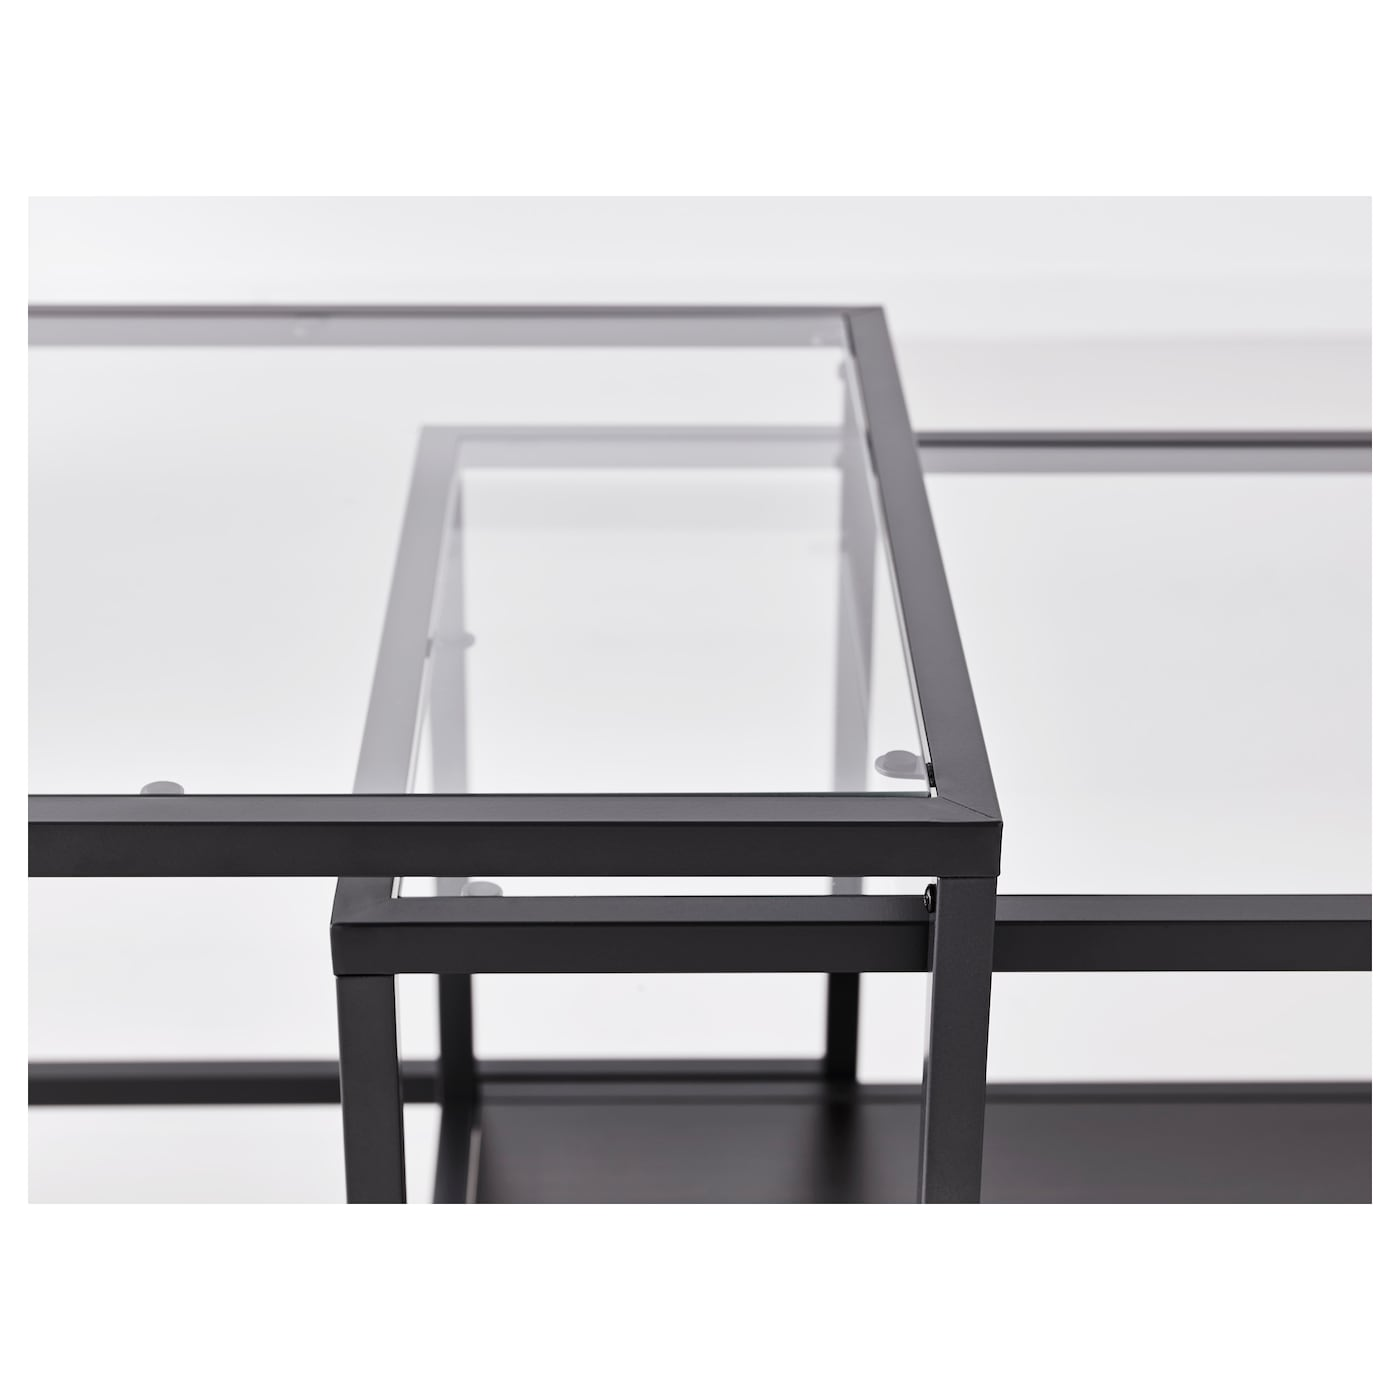 Vittsj tables gigognes lot de 2 brun noir verre 90x50 cm ikea - Tables gigognes ikea ...